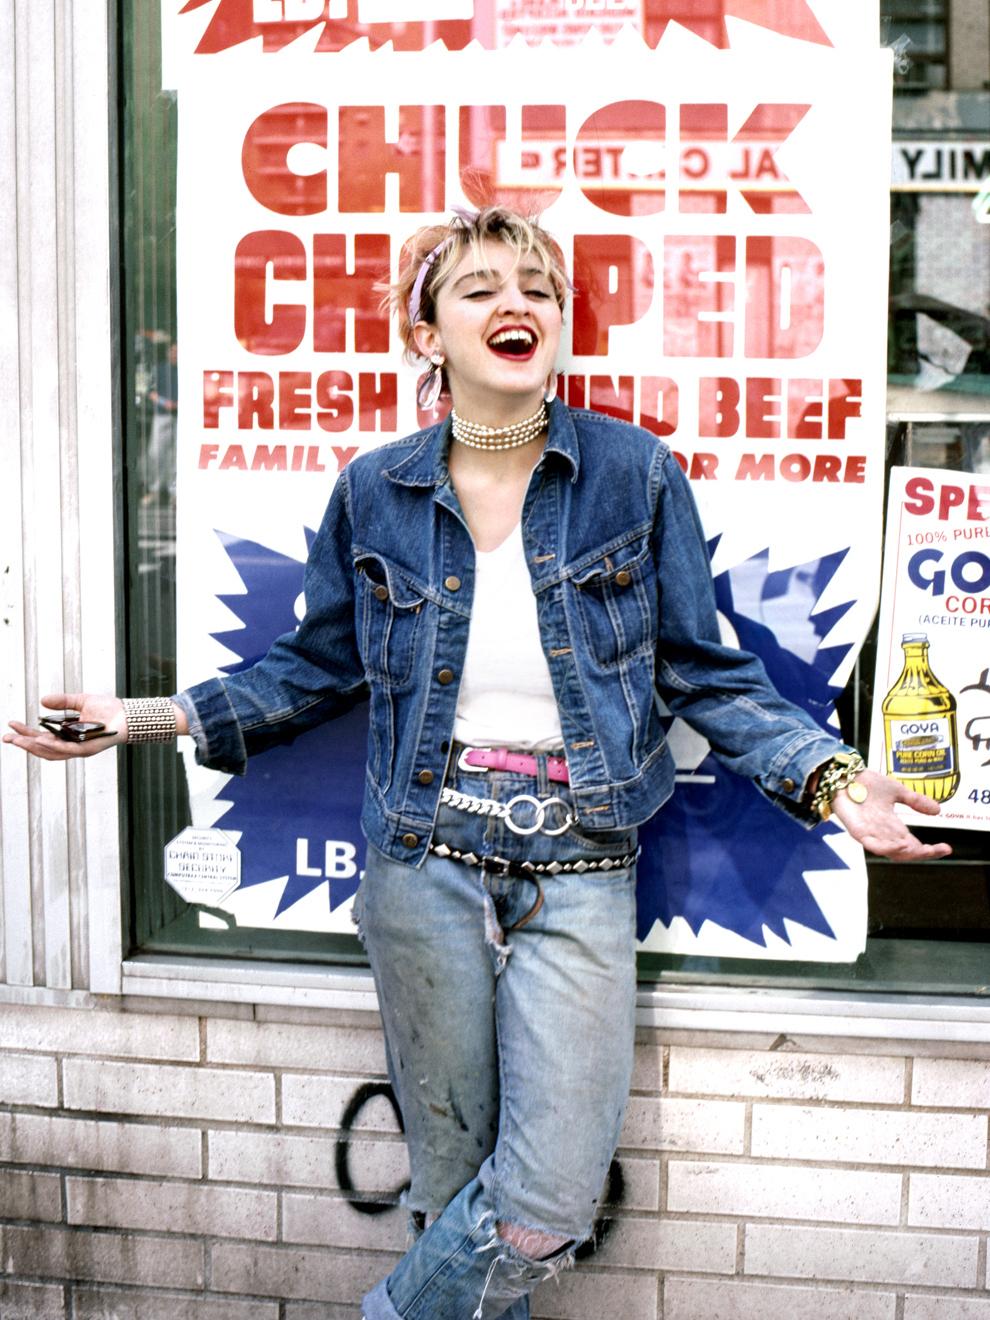 Madonna's street style captured by Richard Corman Image via fashiondotblog.wordpress.com